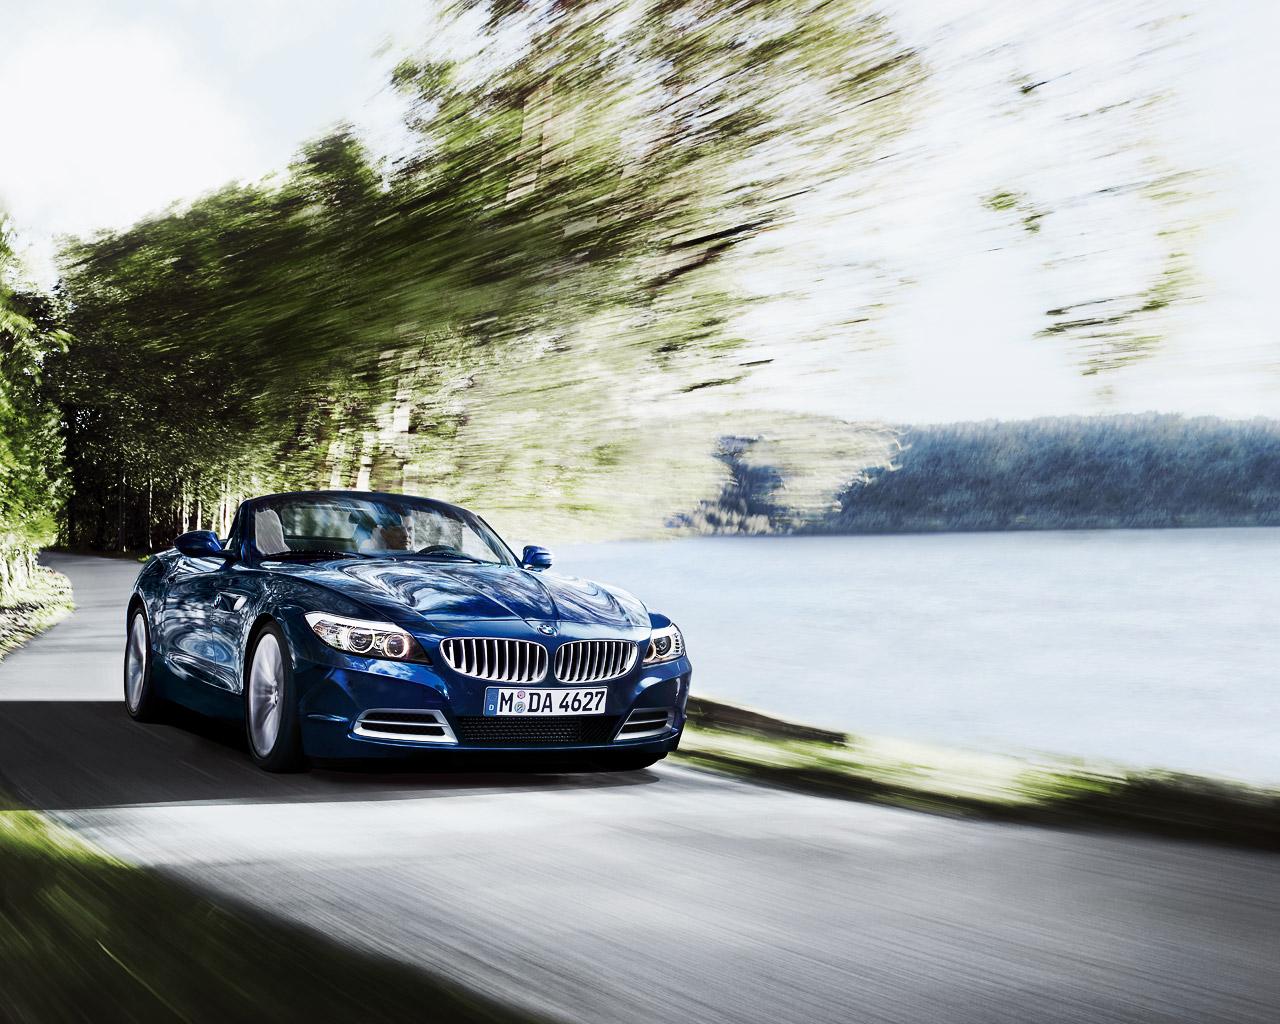 Desktop Wallpapers BMW BMW Z4 auto Cars automobile